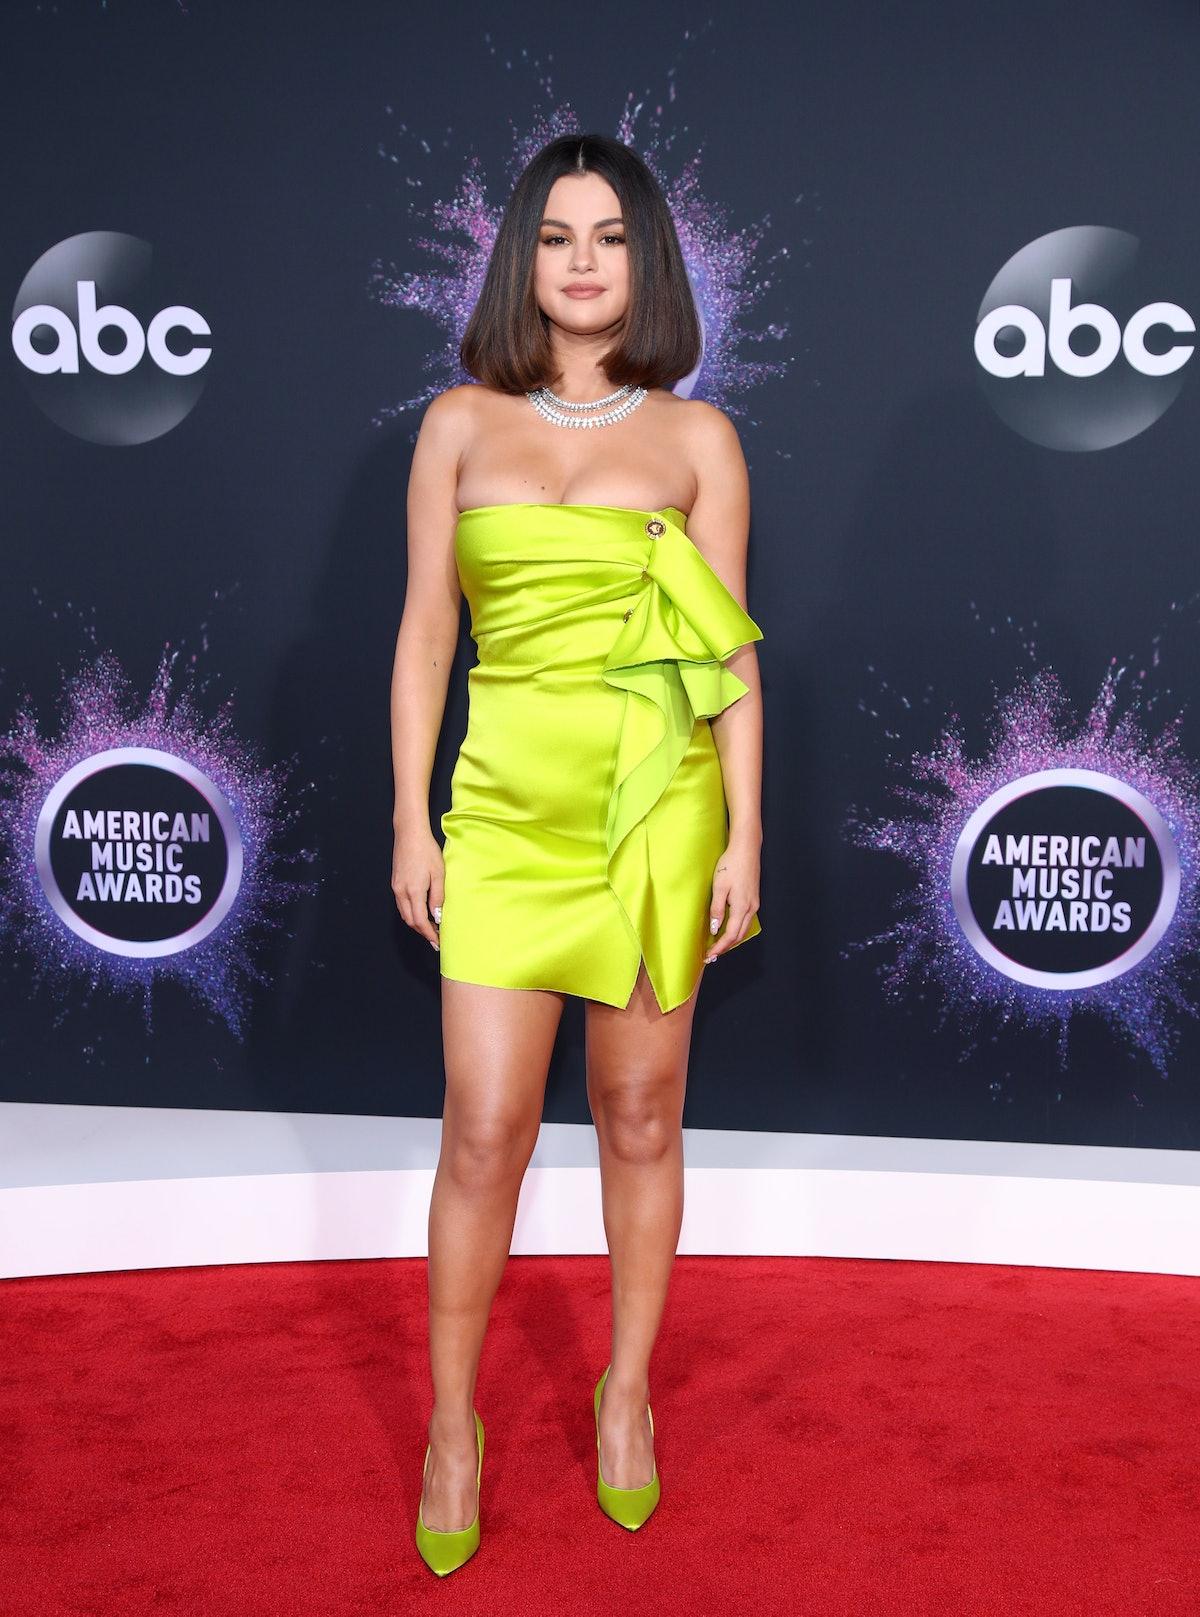 Selena Gomez wearing green